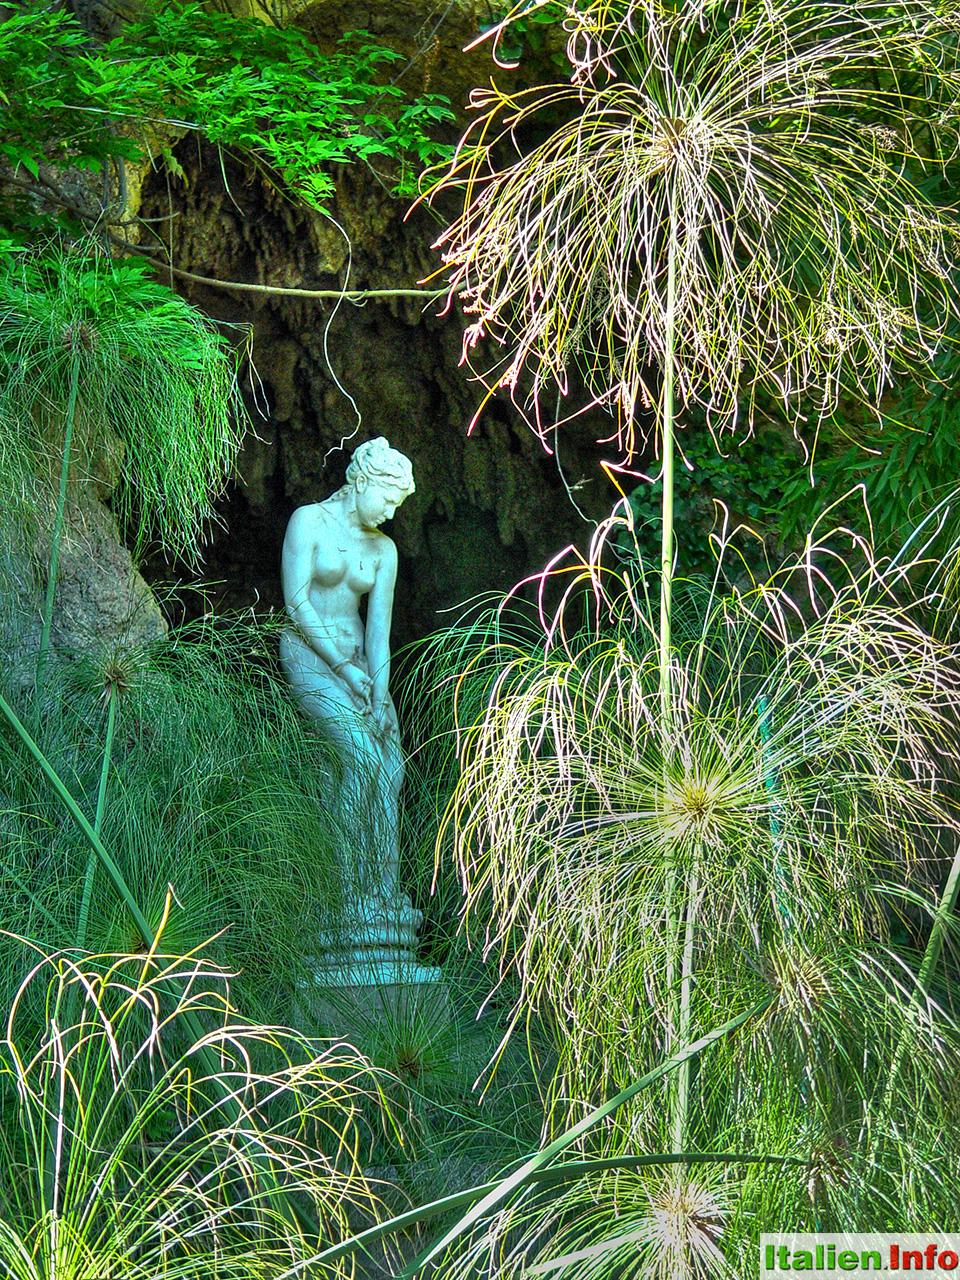 Botanischer Garten Italien Gardasee: Italien.Info